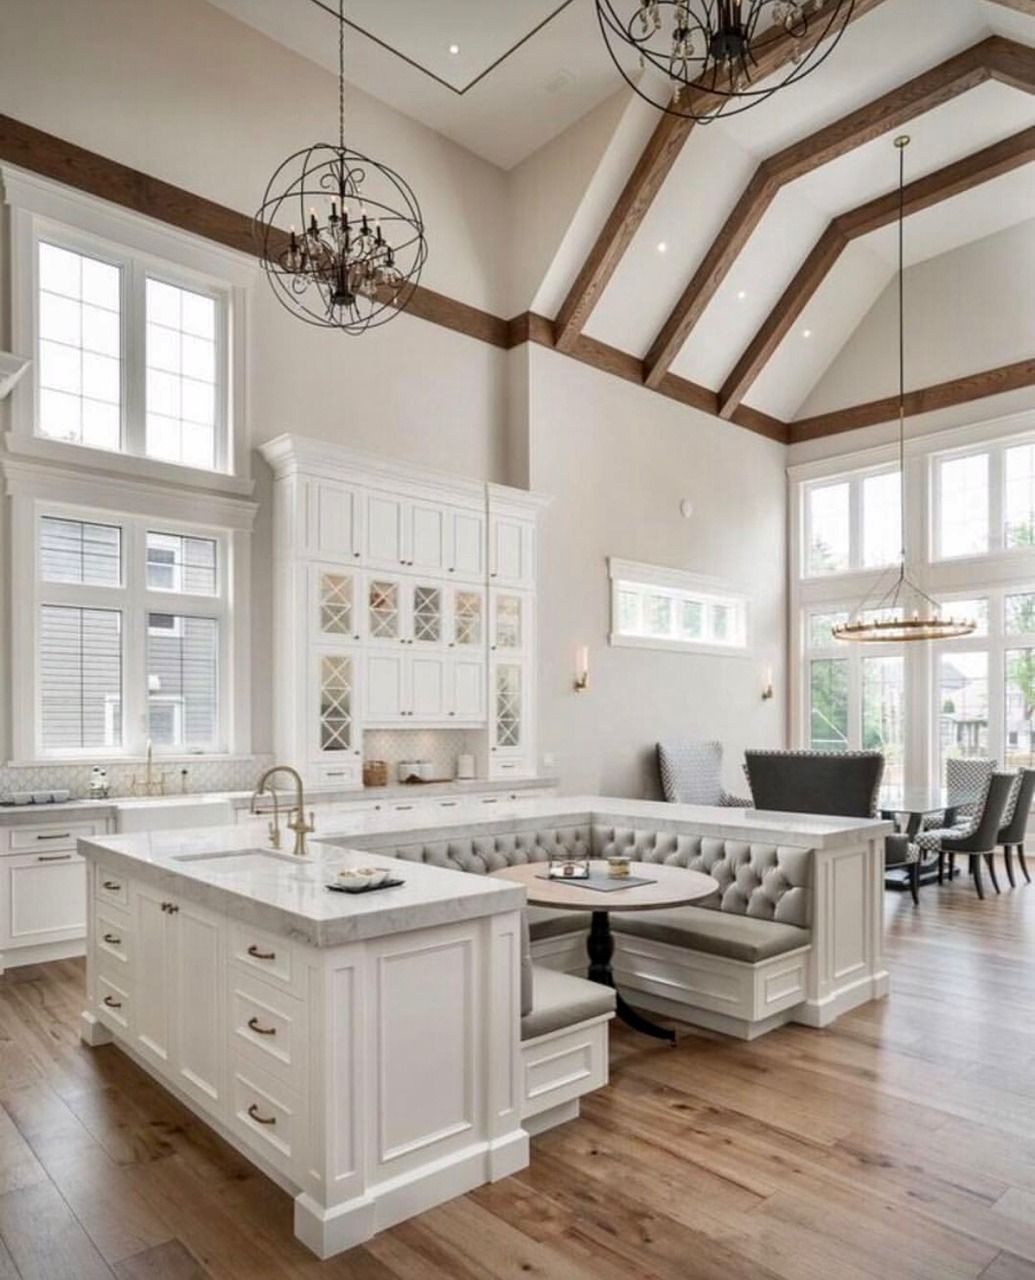 hardwood flooring burlington vt of cottage life dream house pinterest house kitchens and future inside cottage life